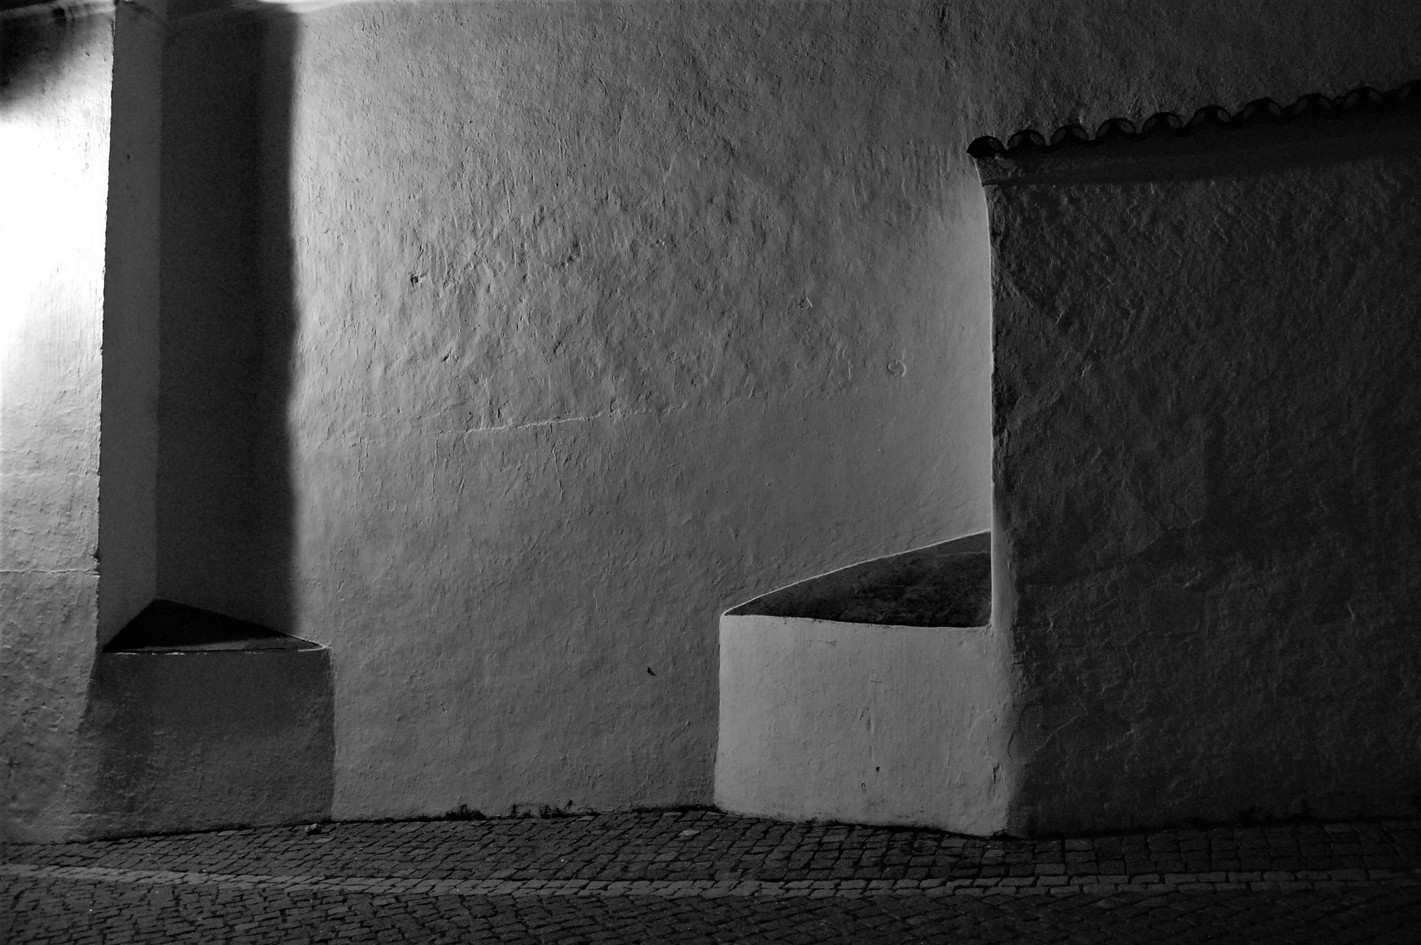 Foto de Miguel Jeremias, 2.º lugar no 1.º Concurso de Fotografia